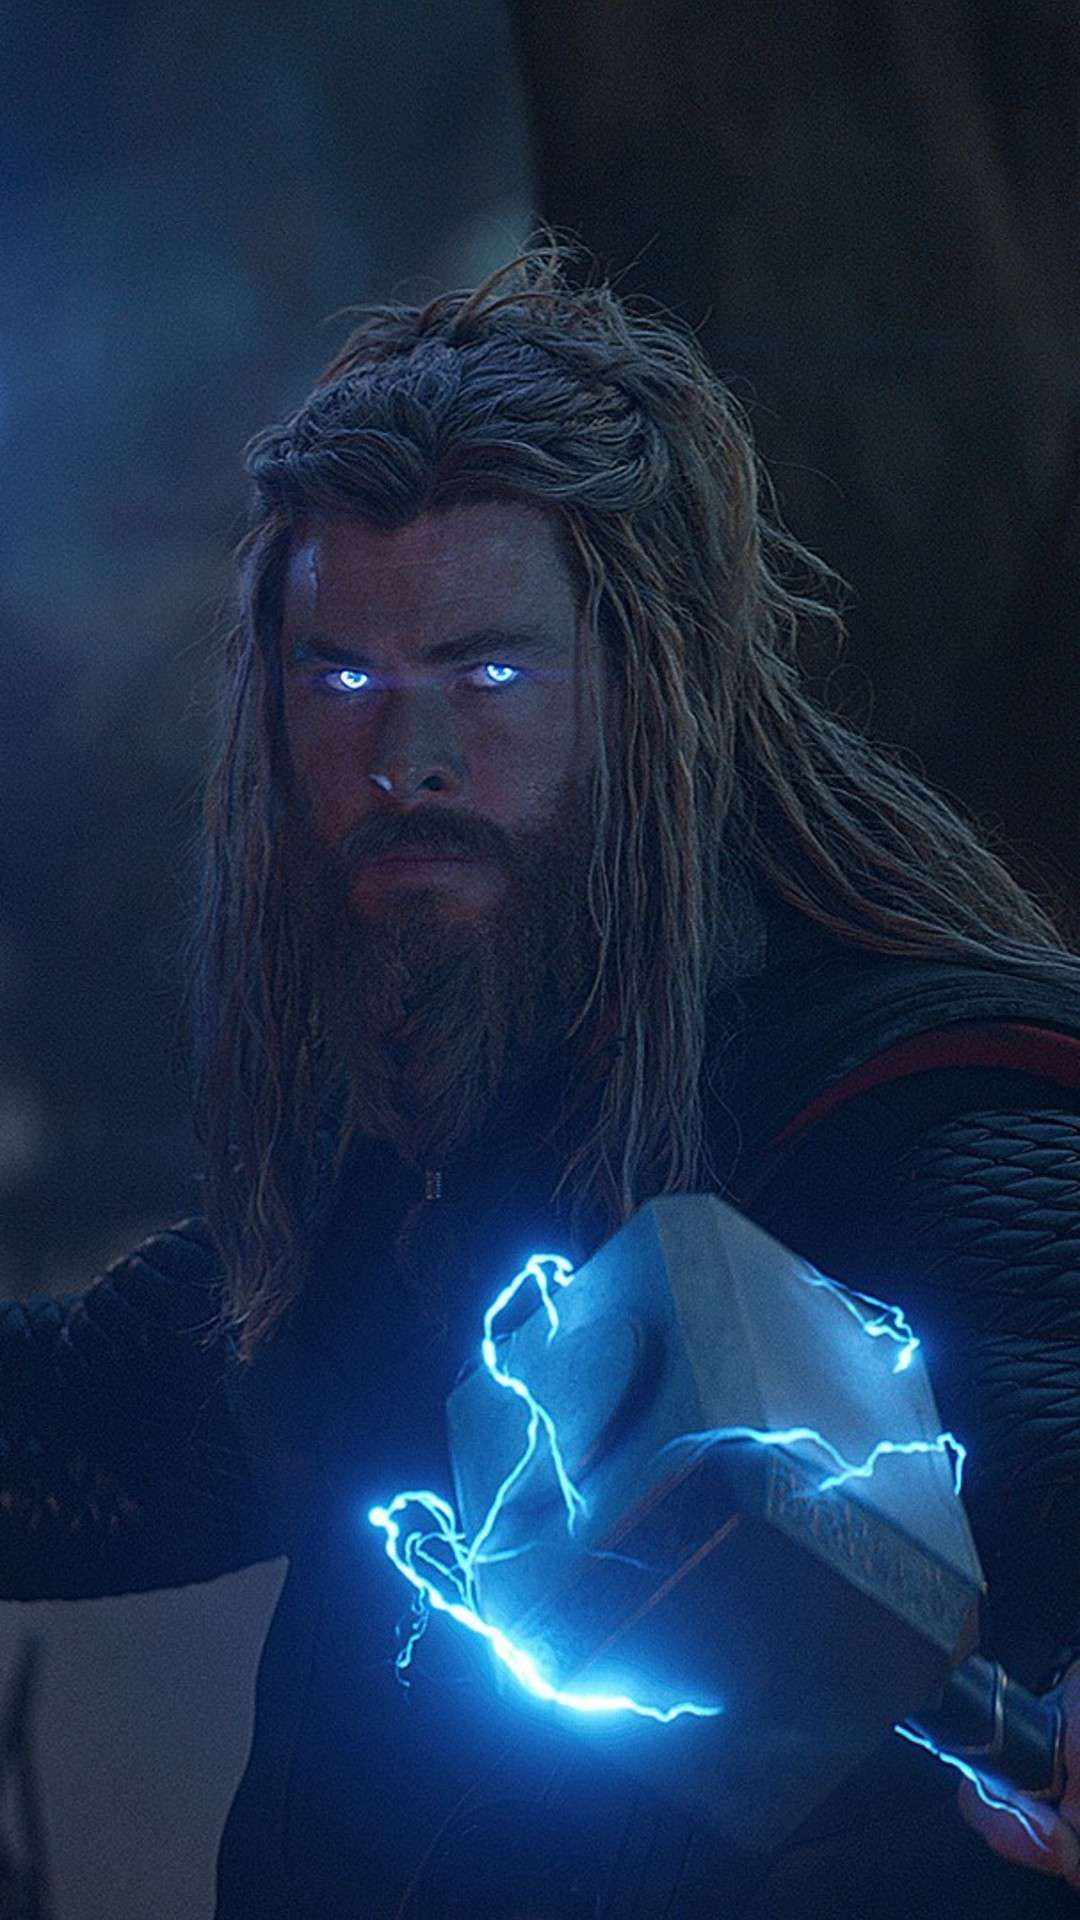 Gordo Pero Hermosooo Marvel Thor Marvel Superheroes Avengers